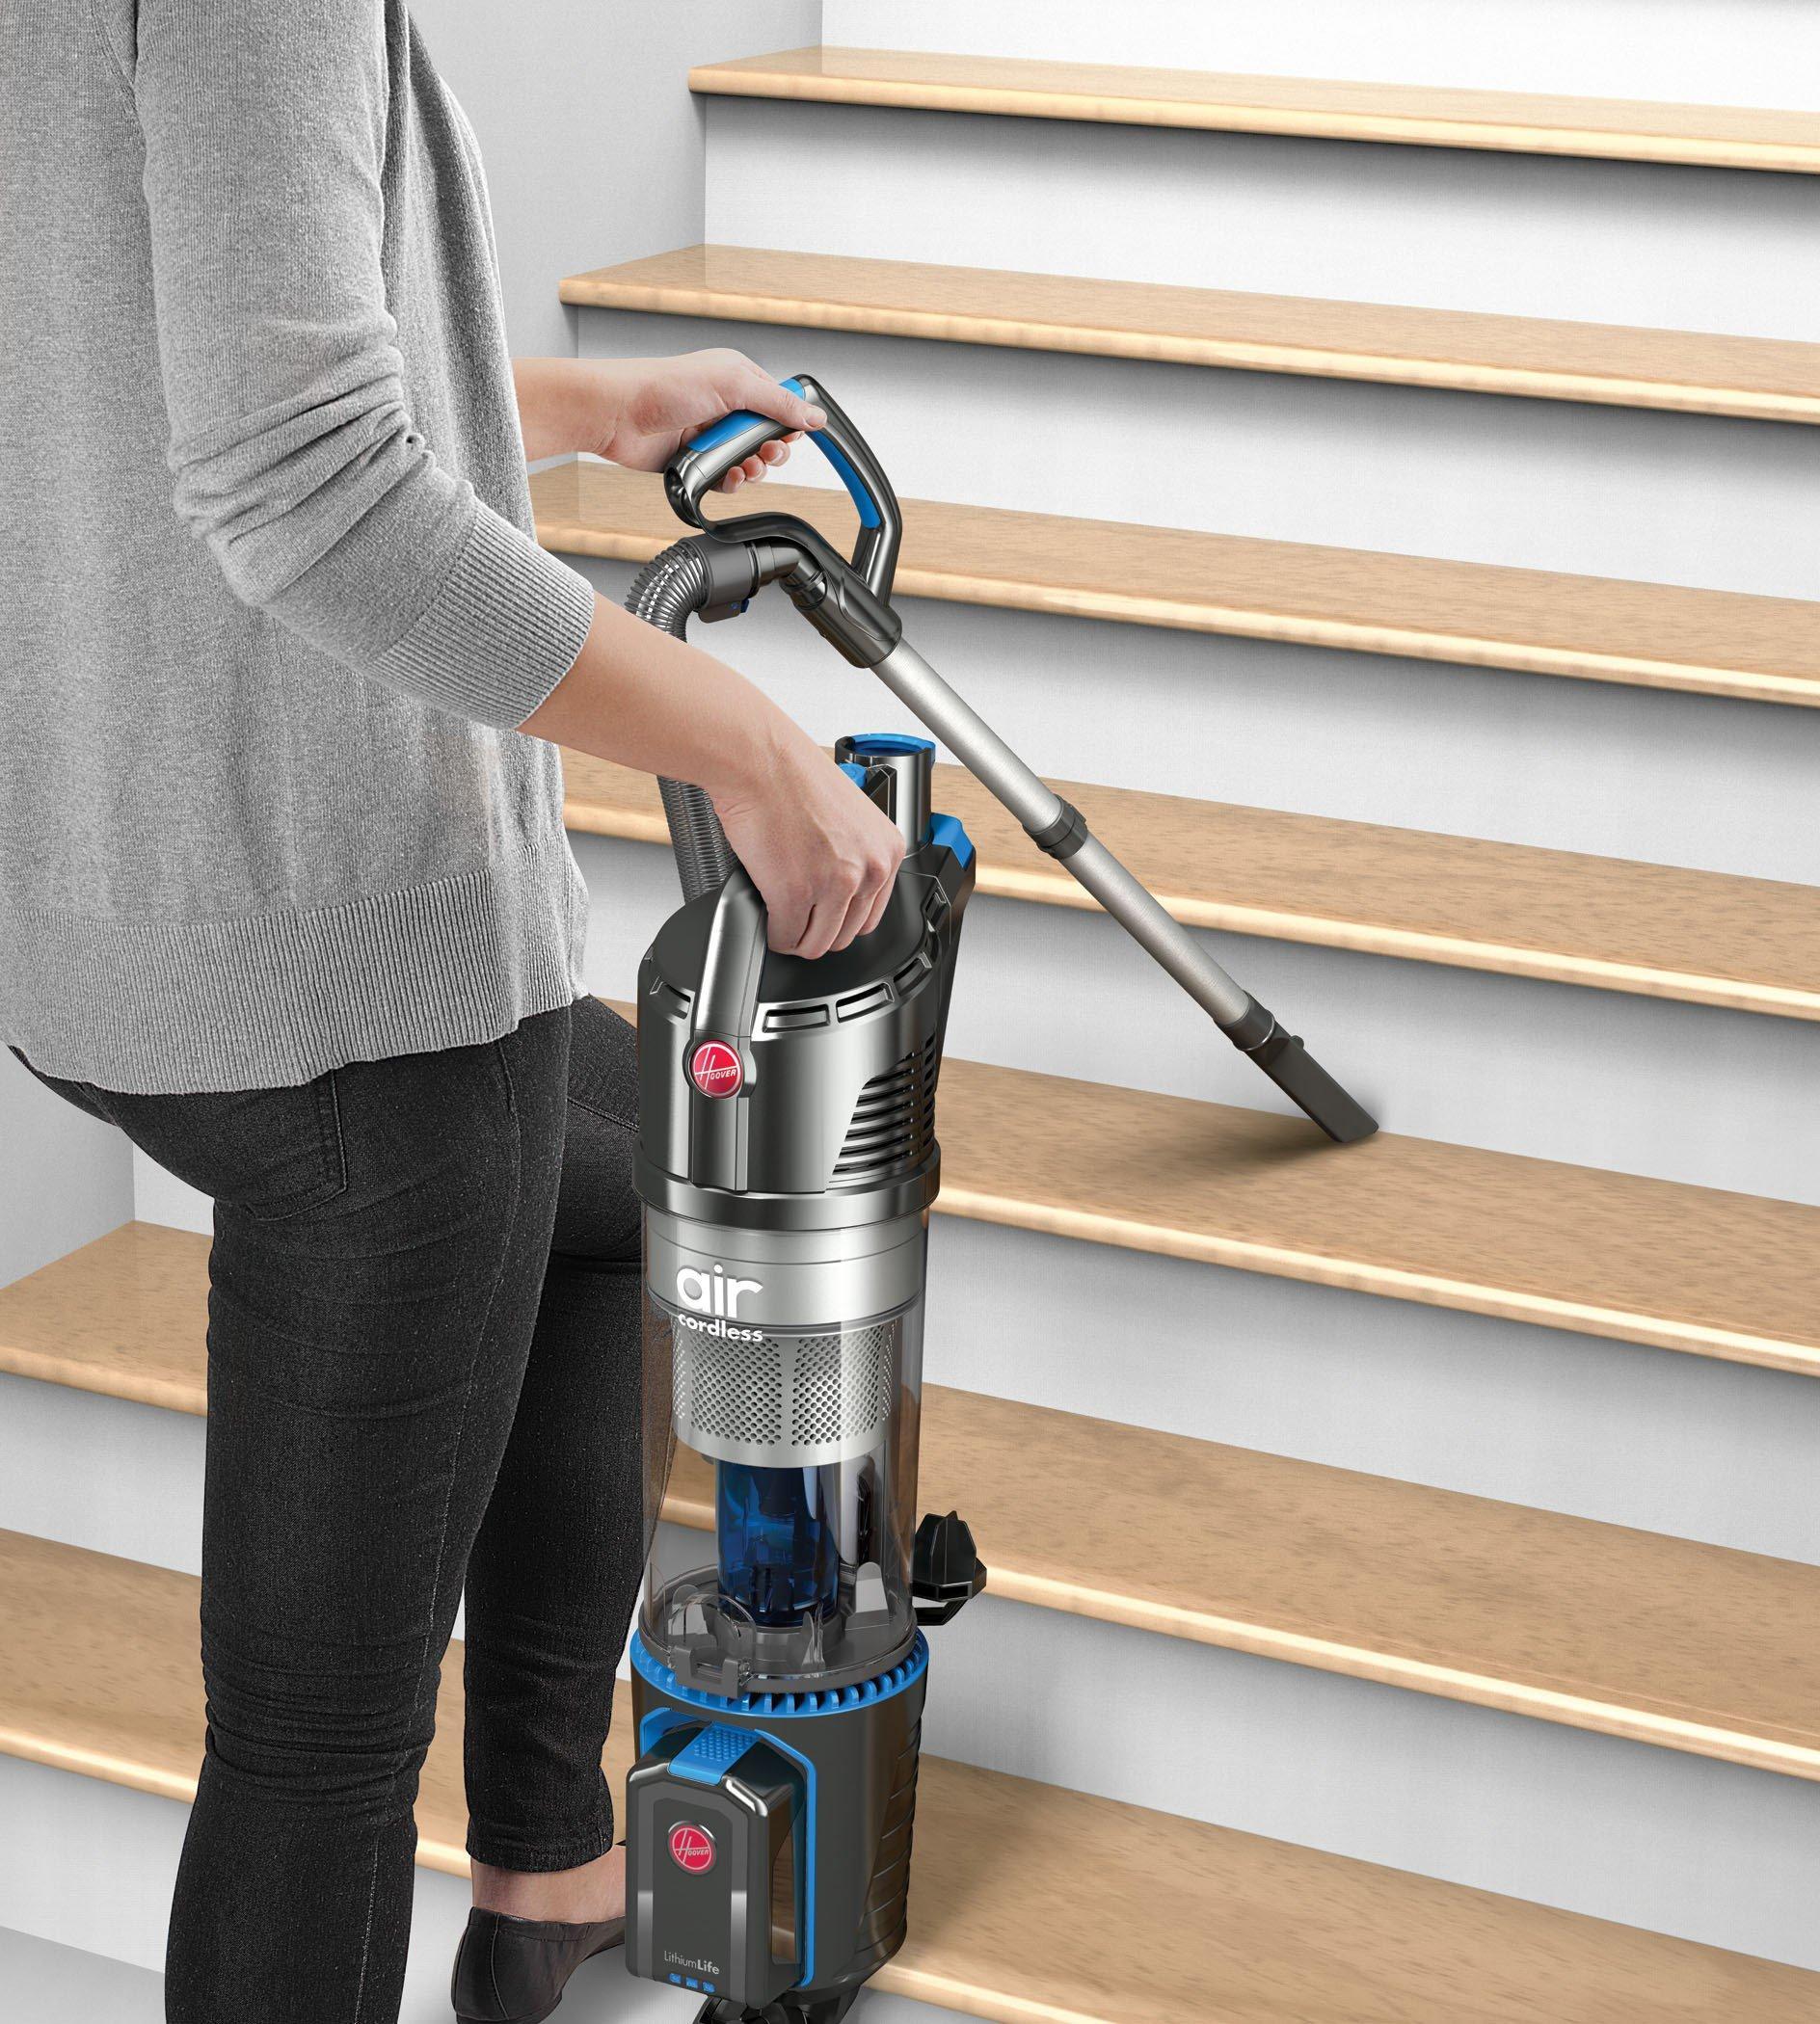 Air™ Cordless Series 1.0 Upright Vacuum6